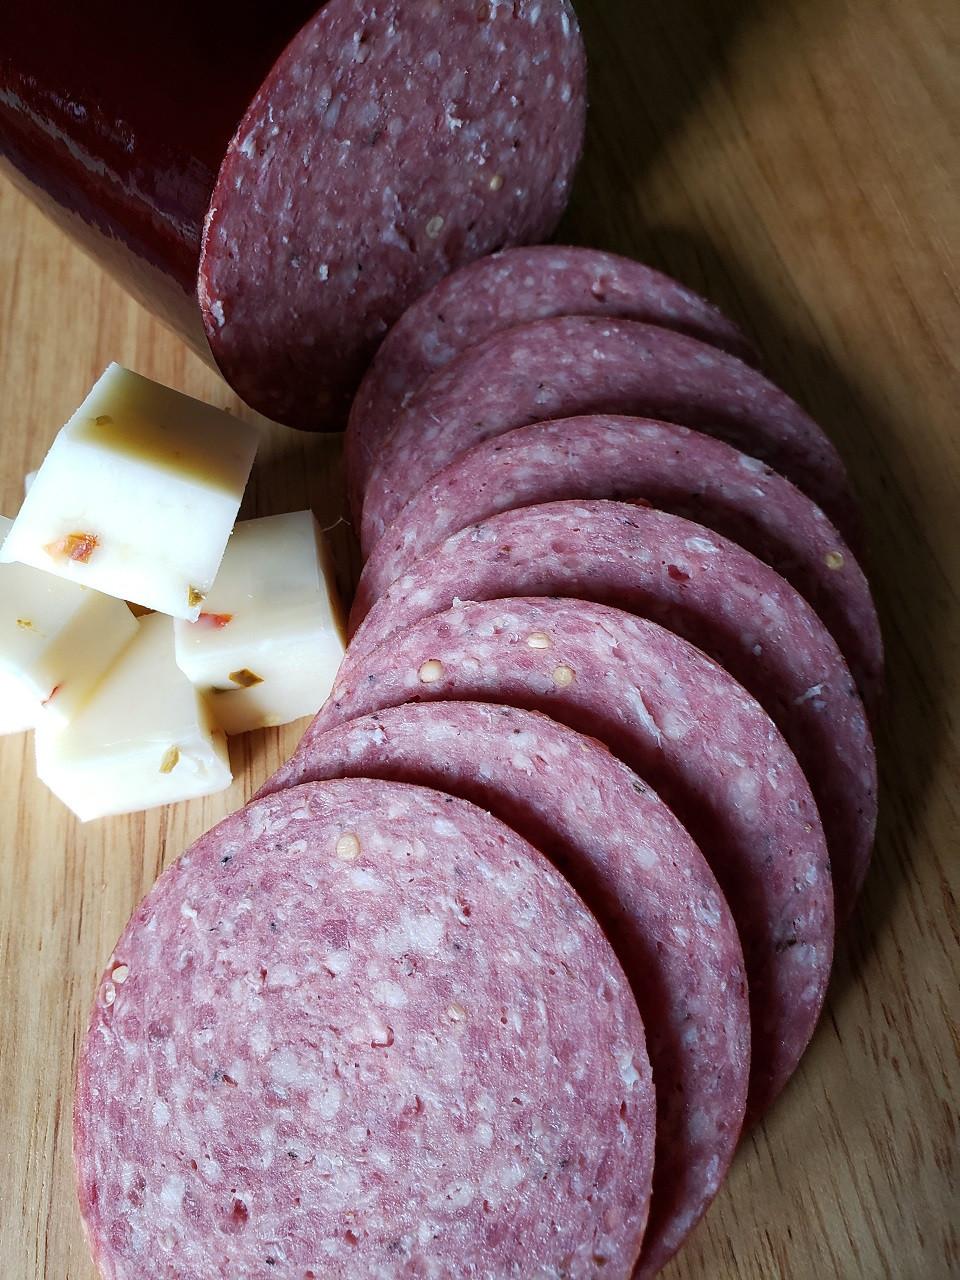 Silver Creek Venison Summer Sausage with pork & beef  1 lbs.